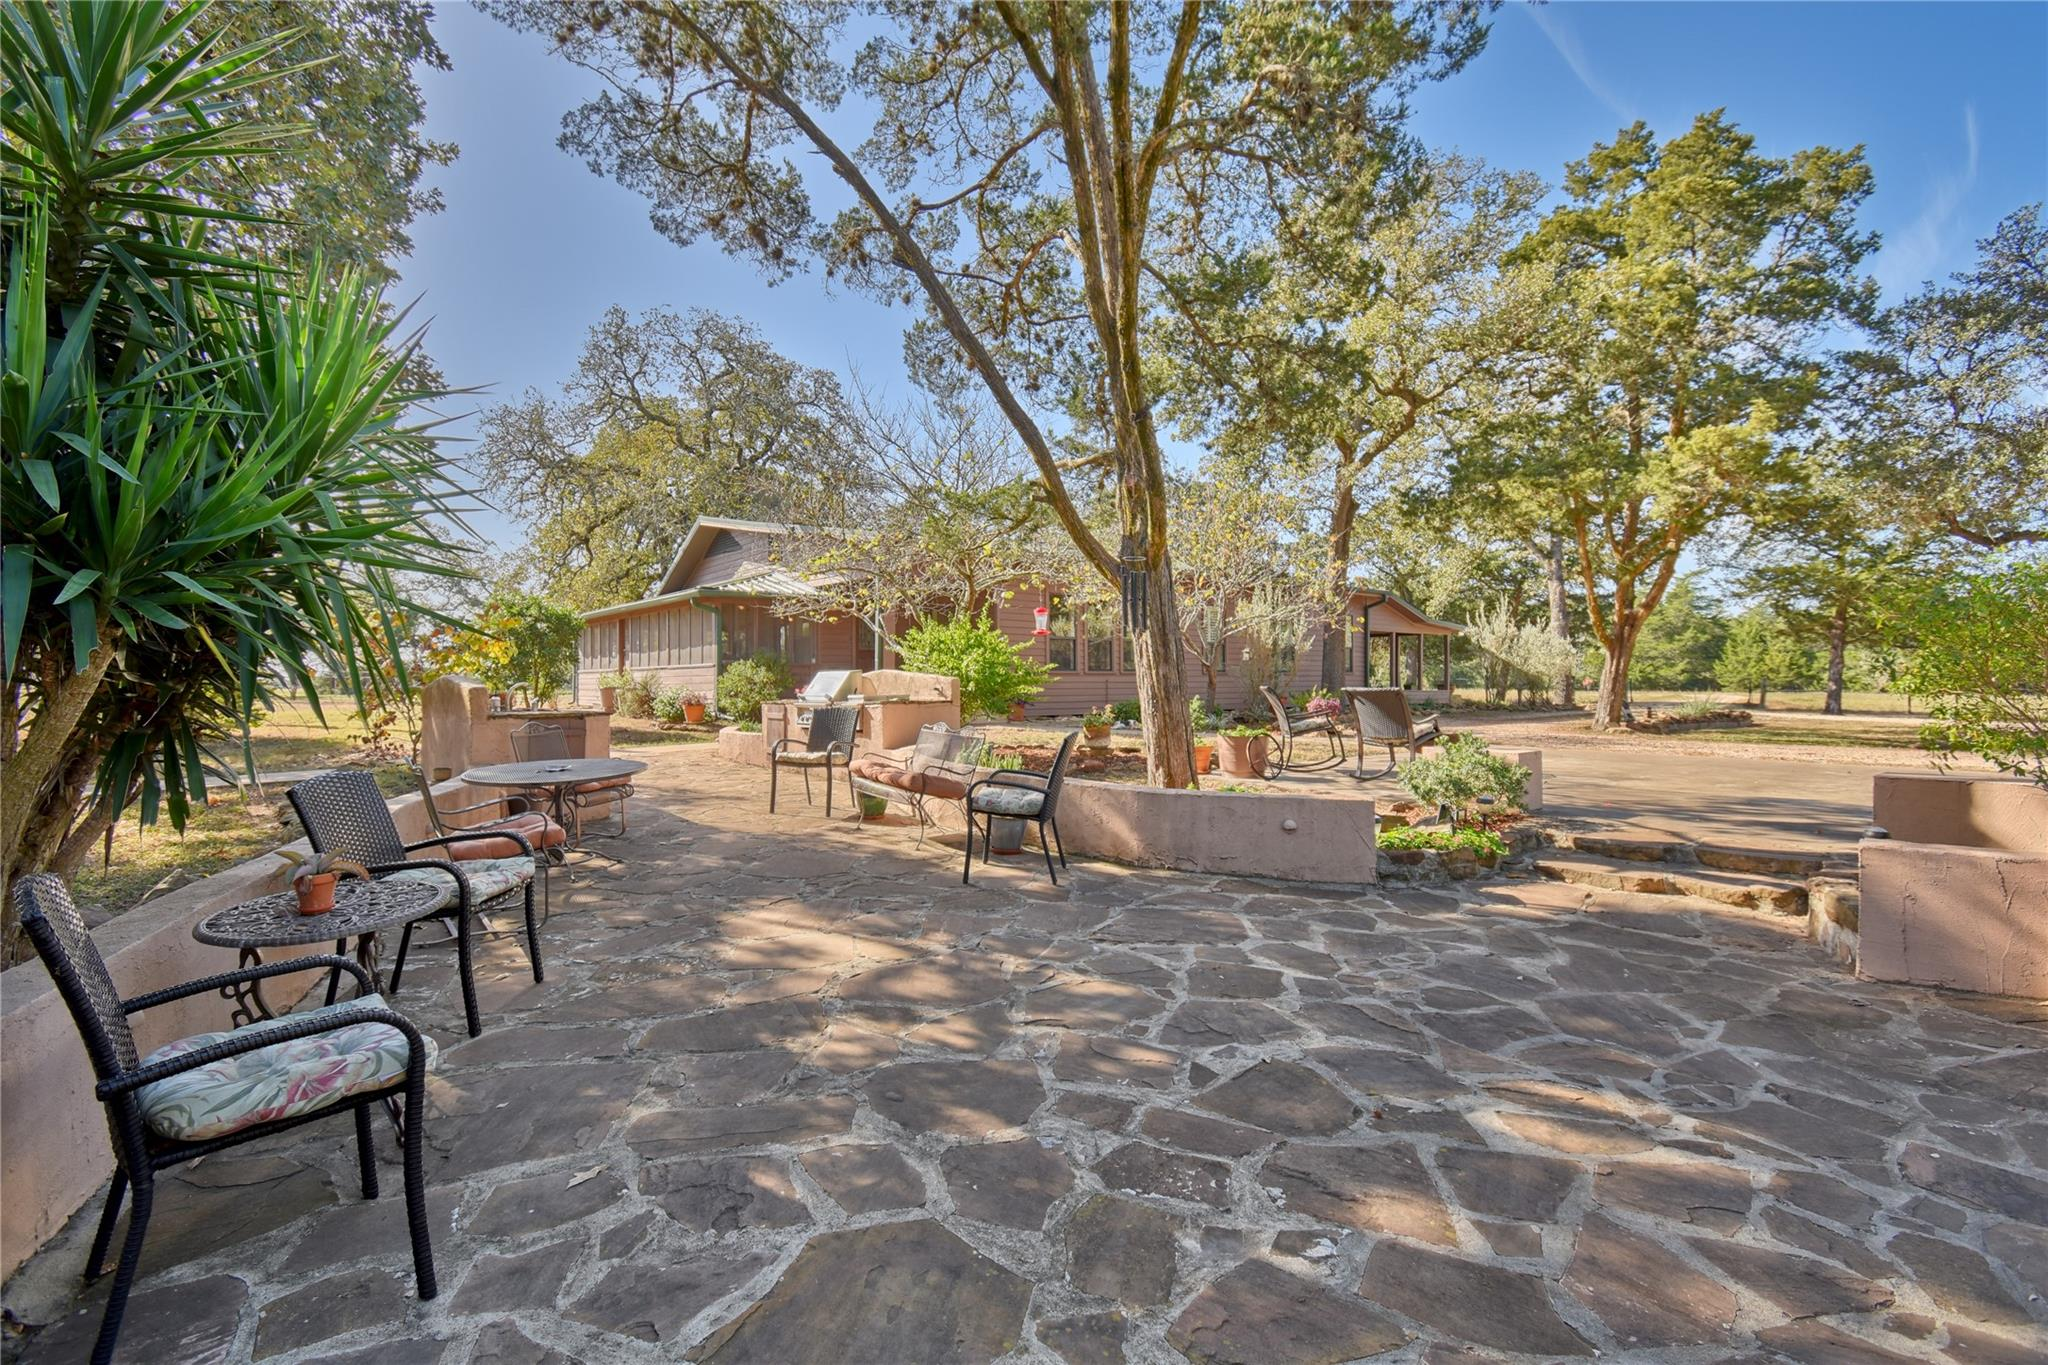 3353 Fm 957 Property Photo - Hallettsville, TX real estate listing